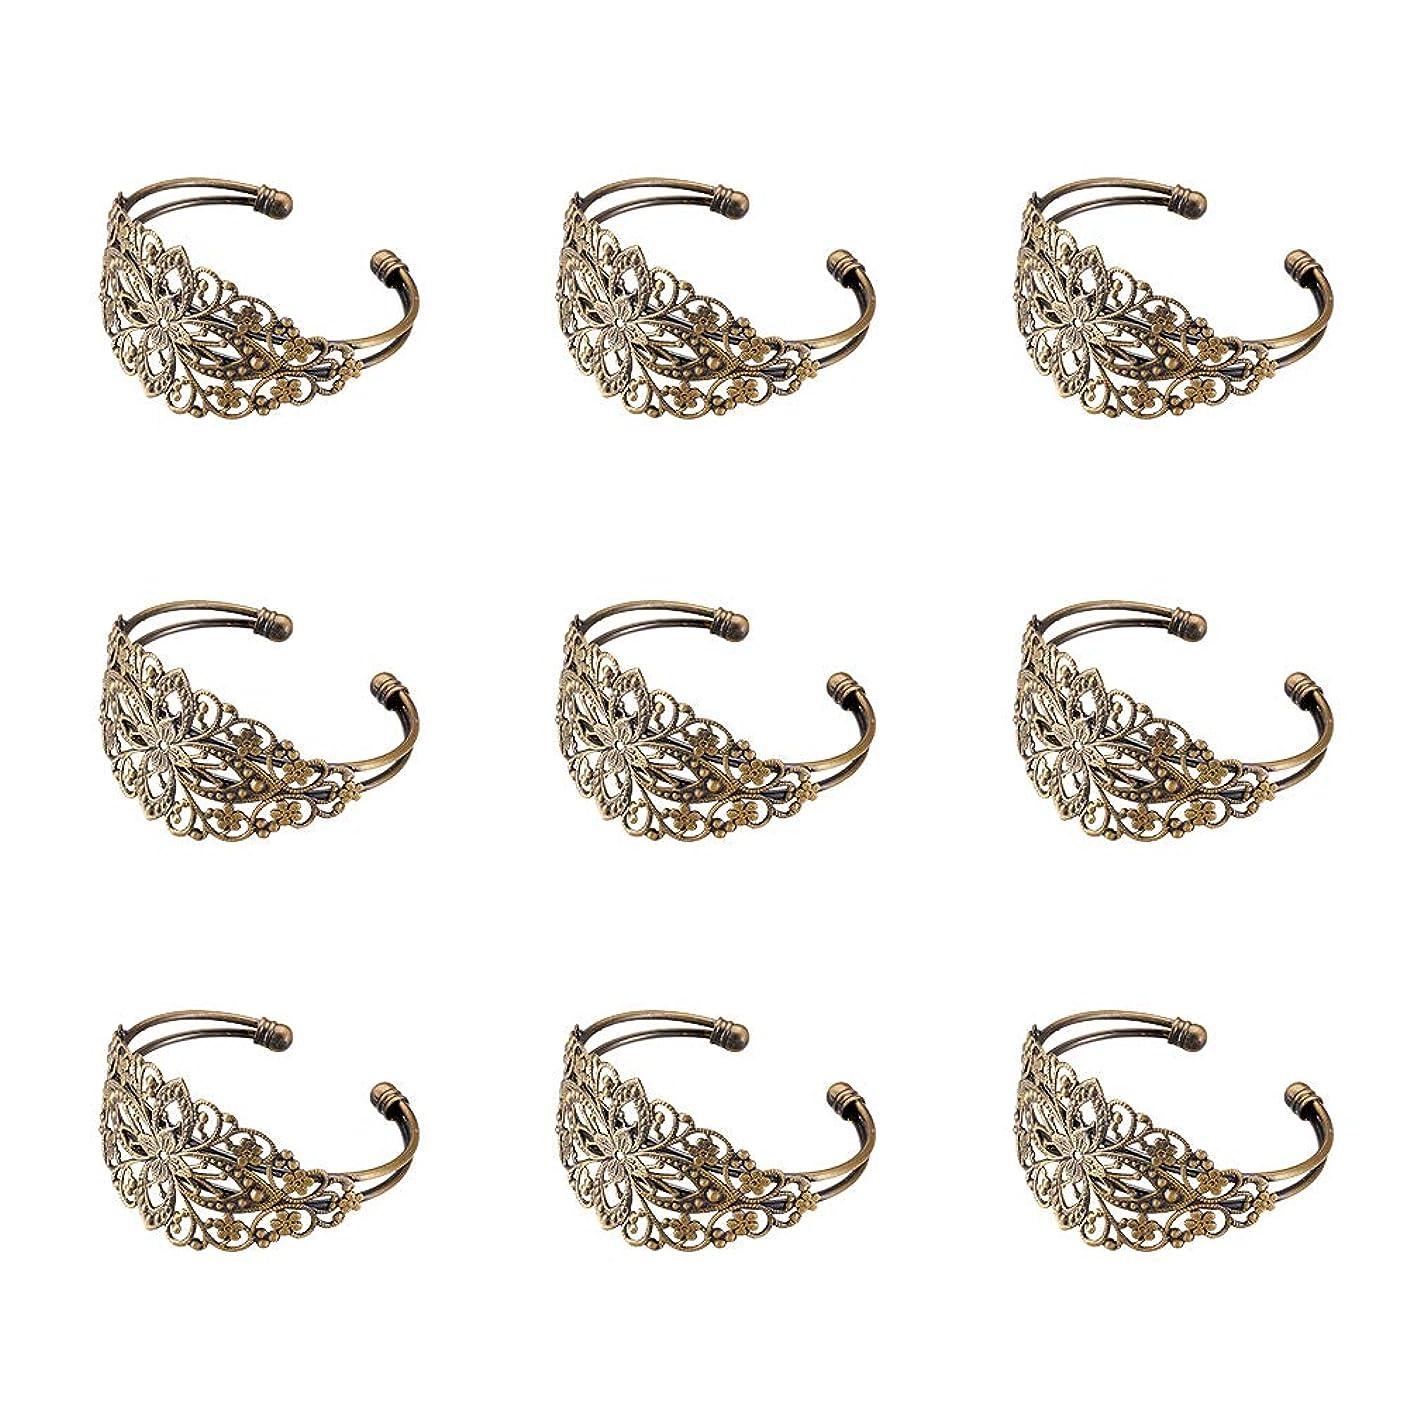 Beadthoven 5pcs Adjustable Bass Cuff Filigree Bracelet Making Cadmium Free & Nickel Free & Lead Free Antique Bronze Color